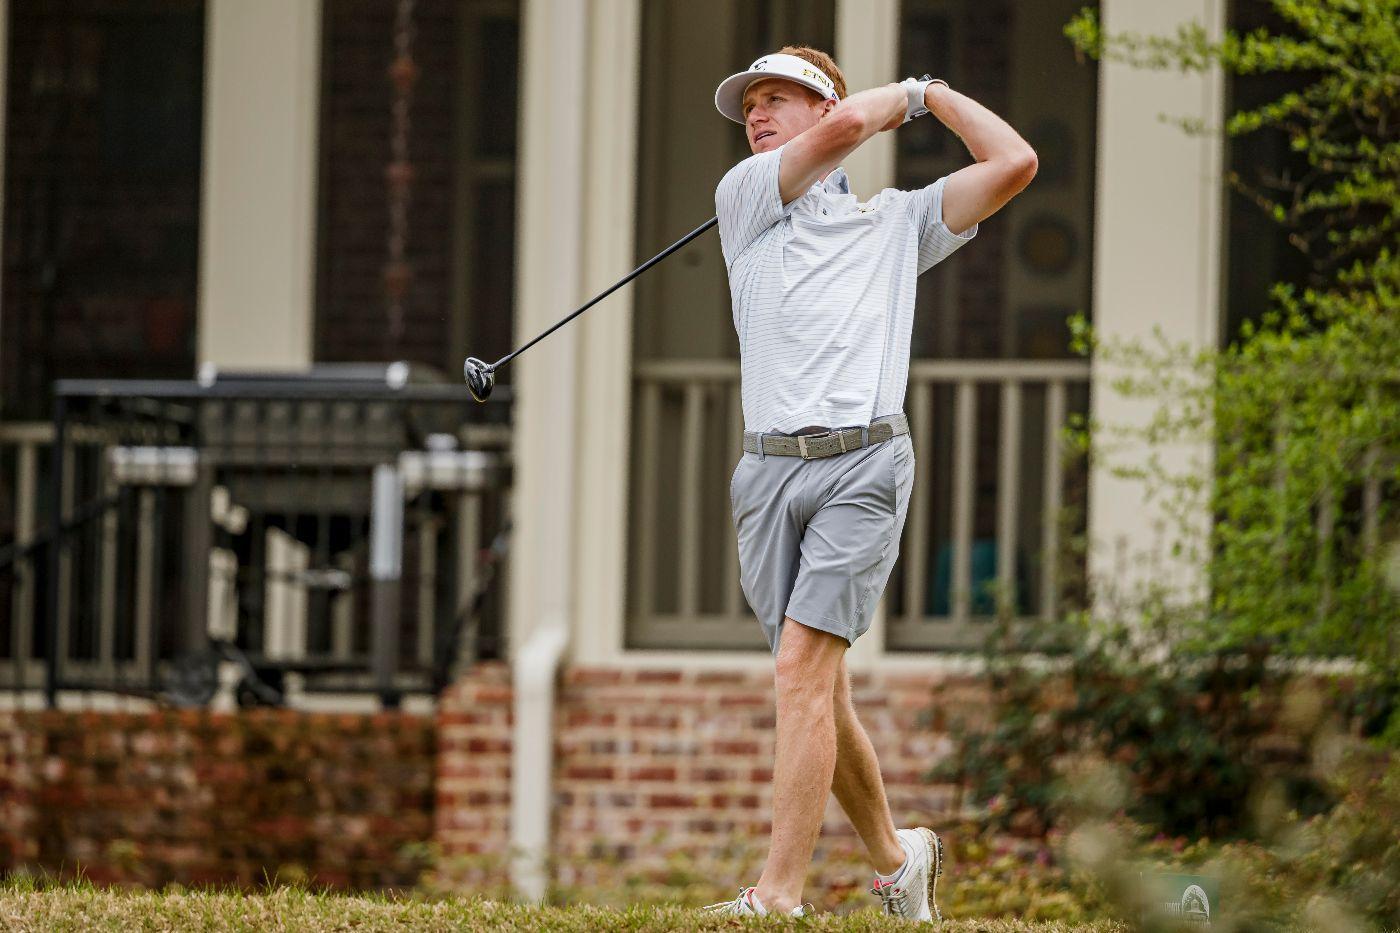 Bucs Conclude Regular Season in North Carolina